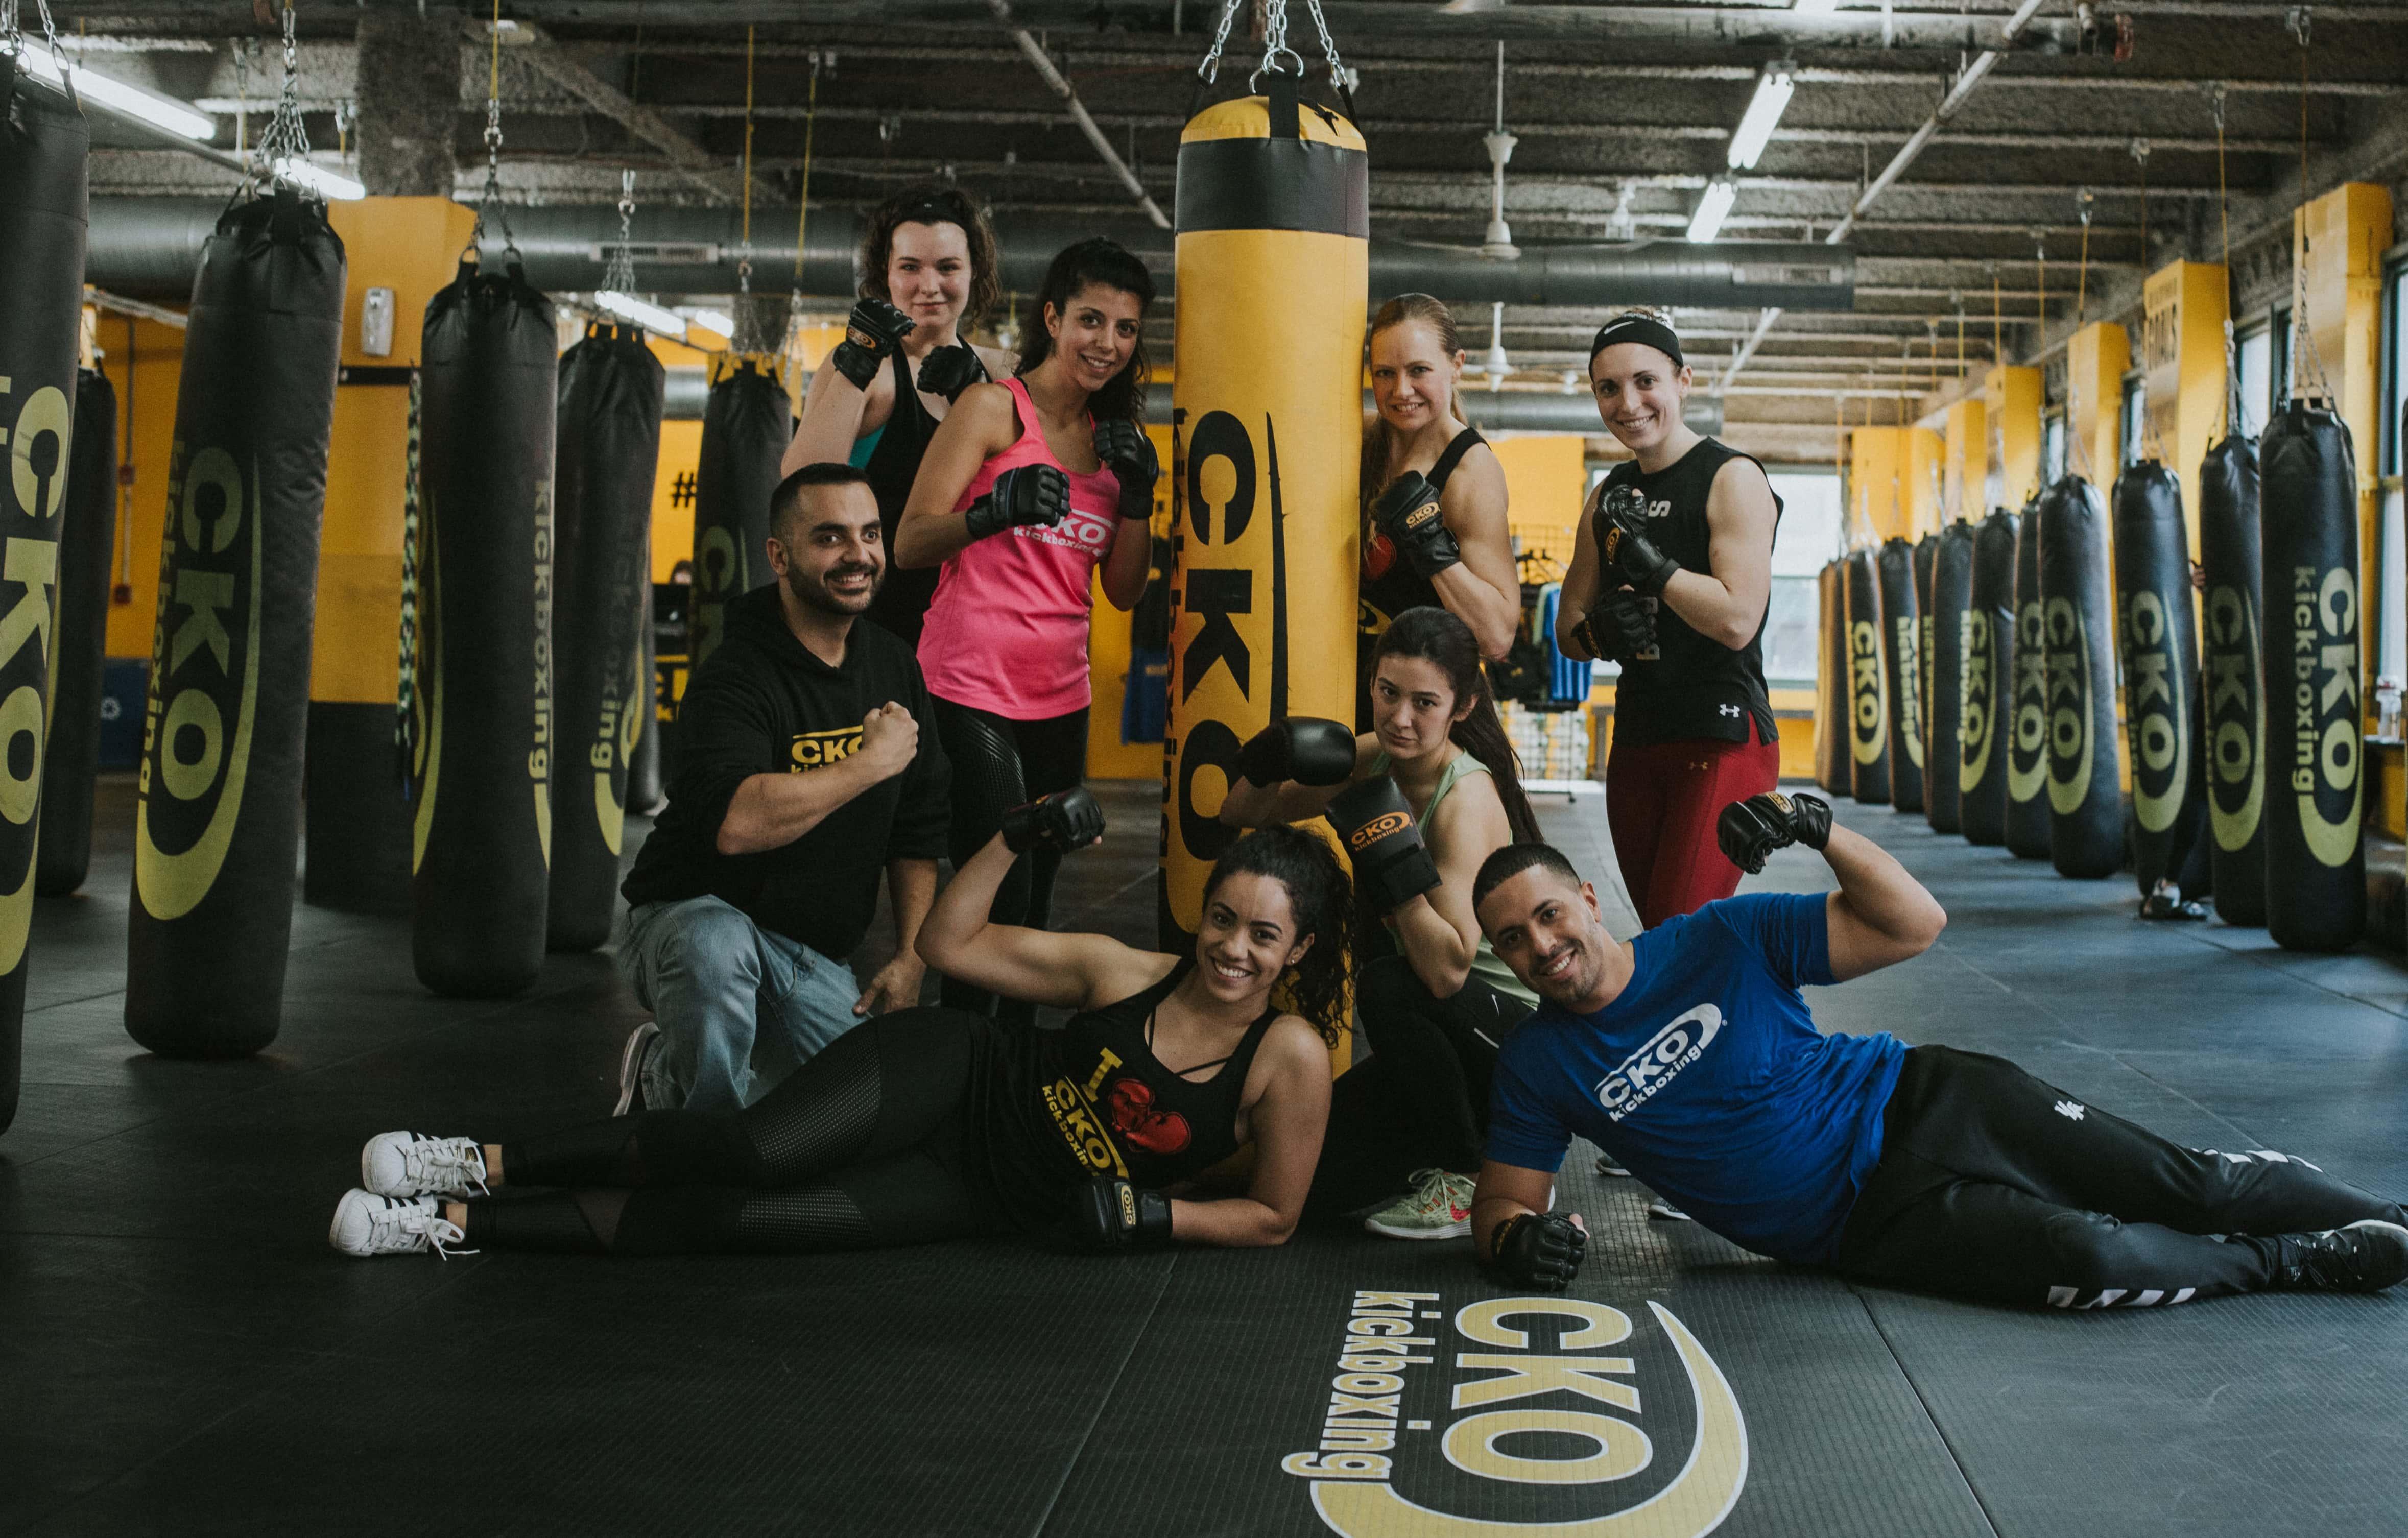 Group Kickboxing